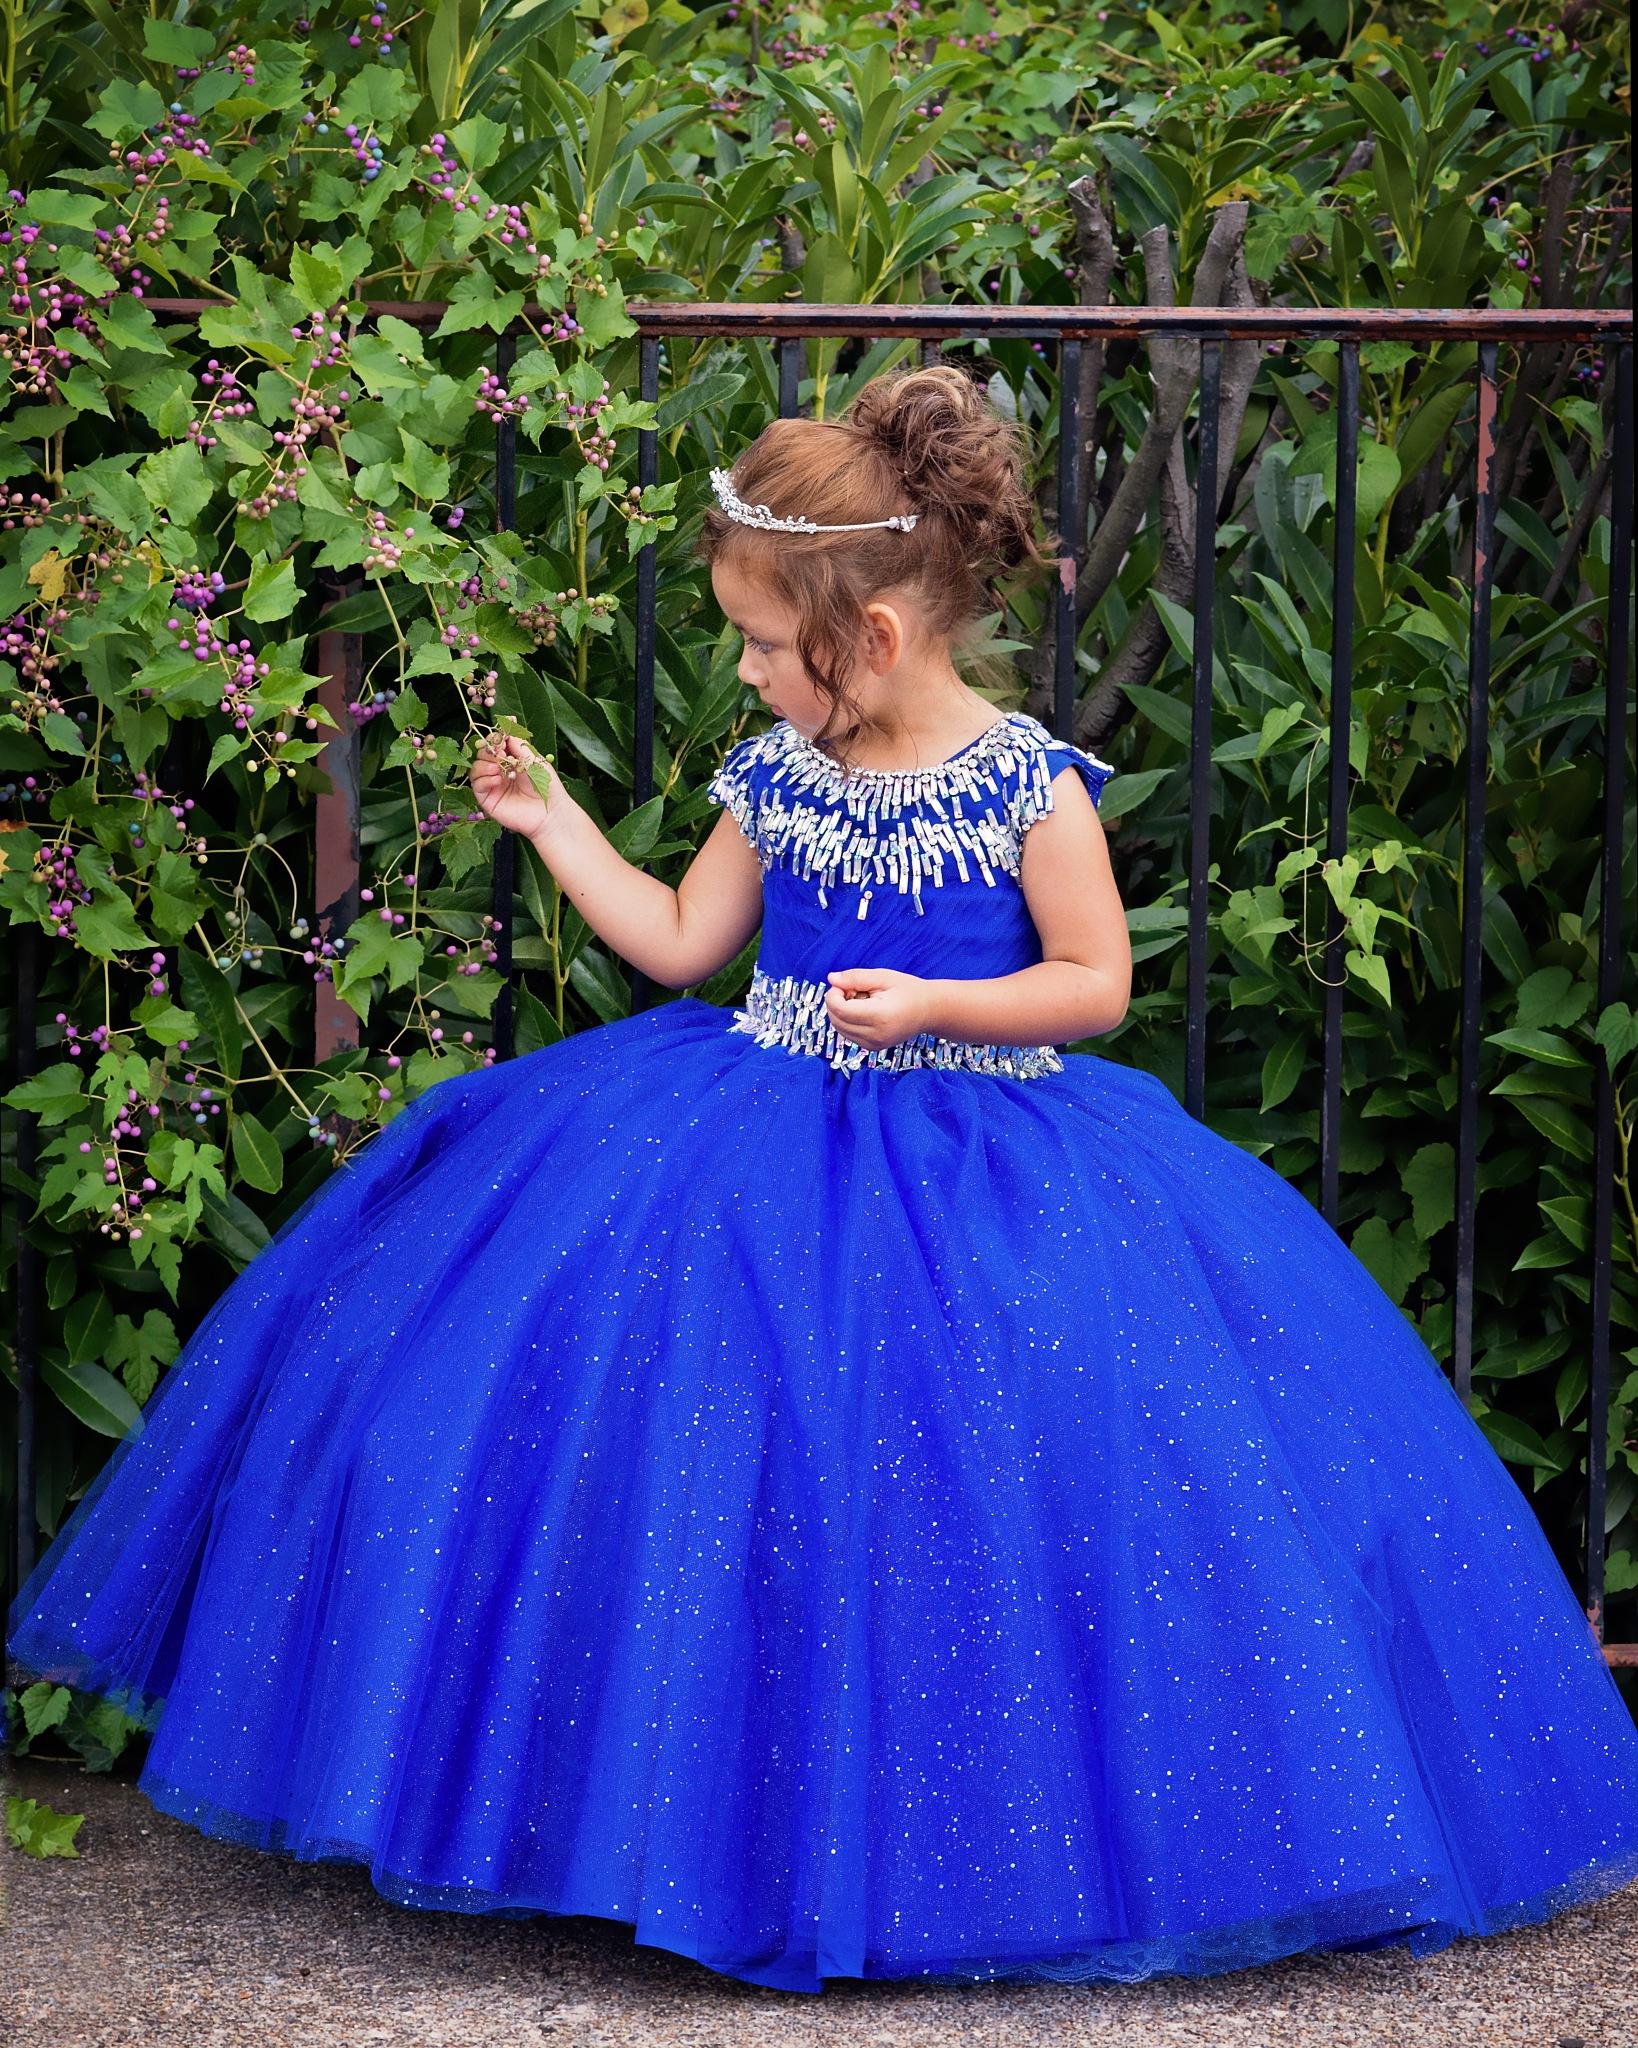 Curious Princess by Elizabeth Funes